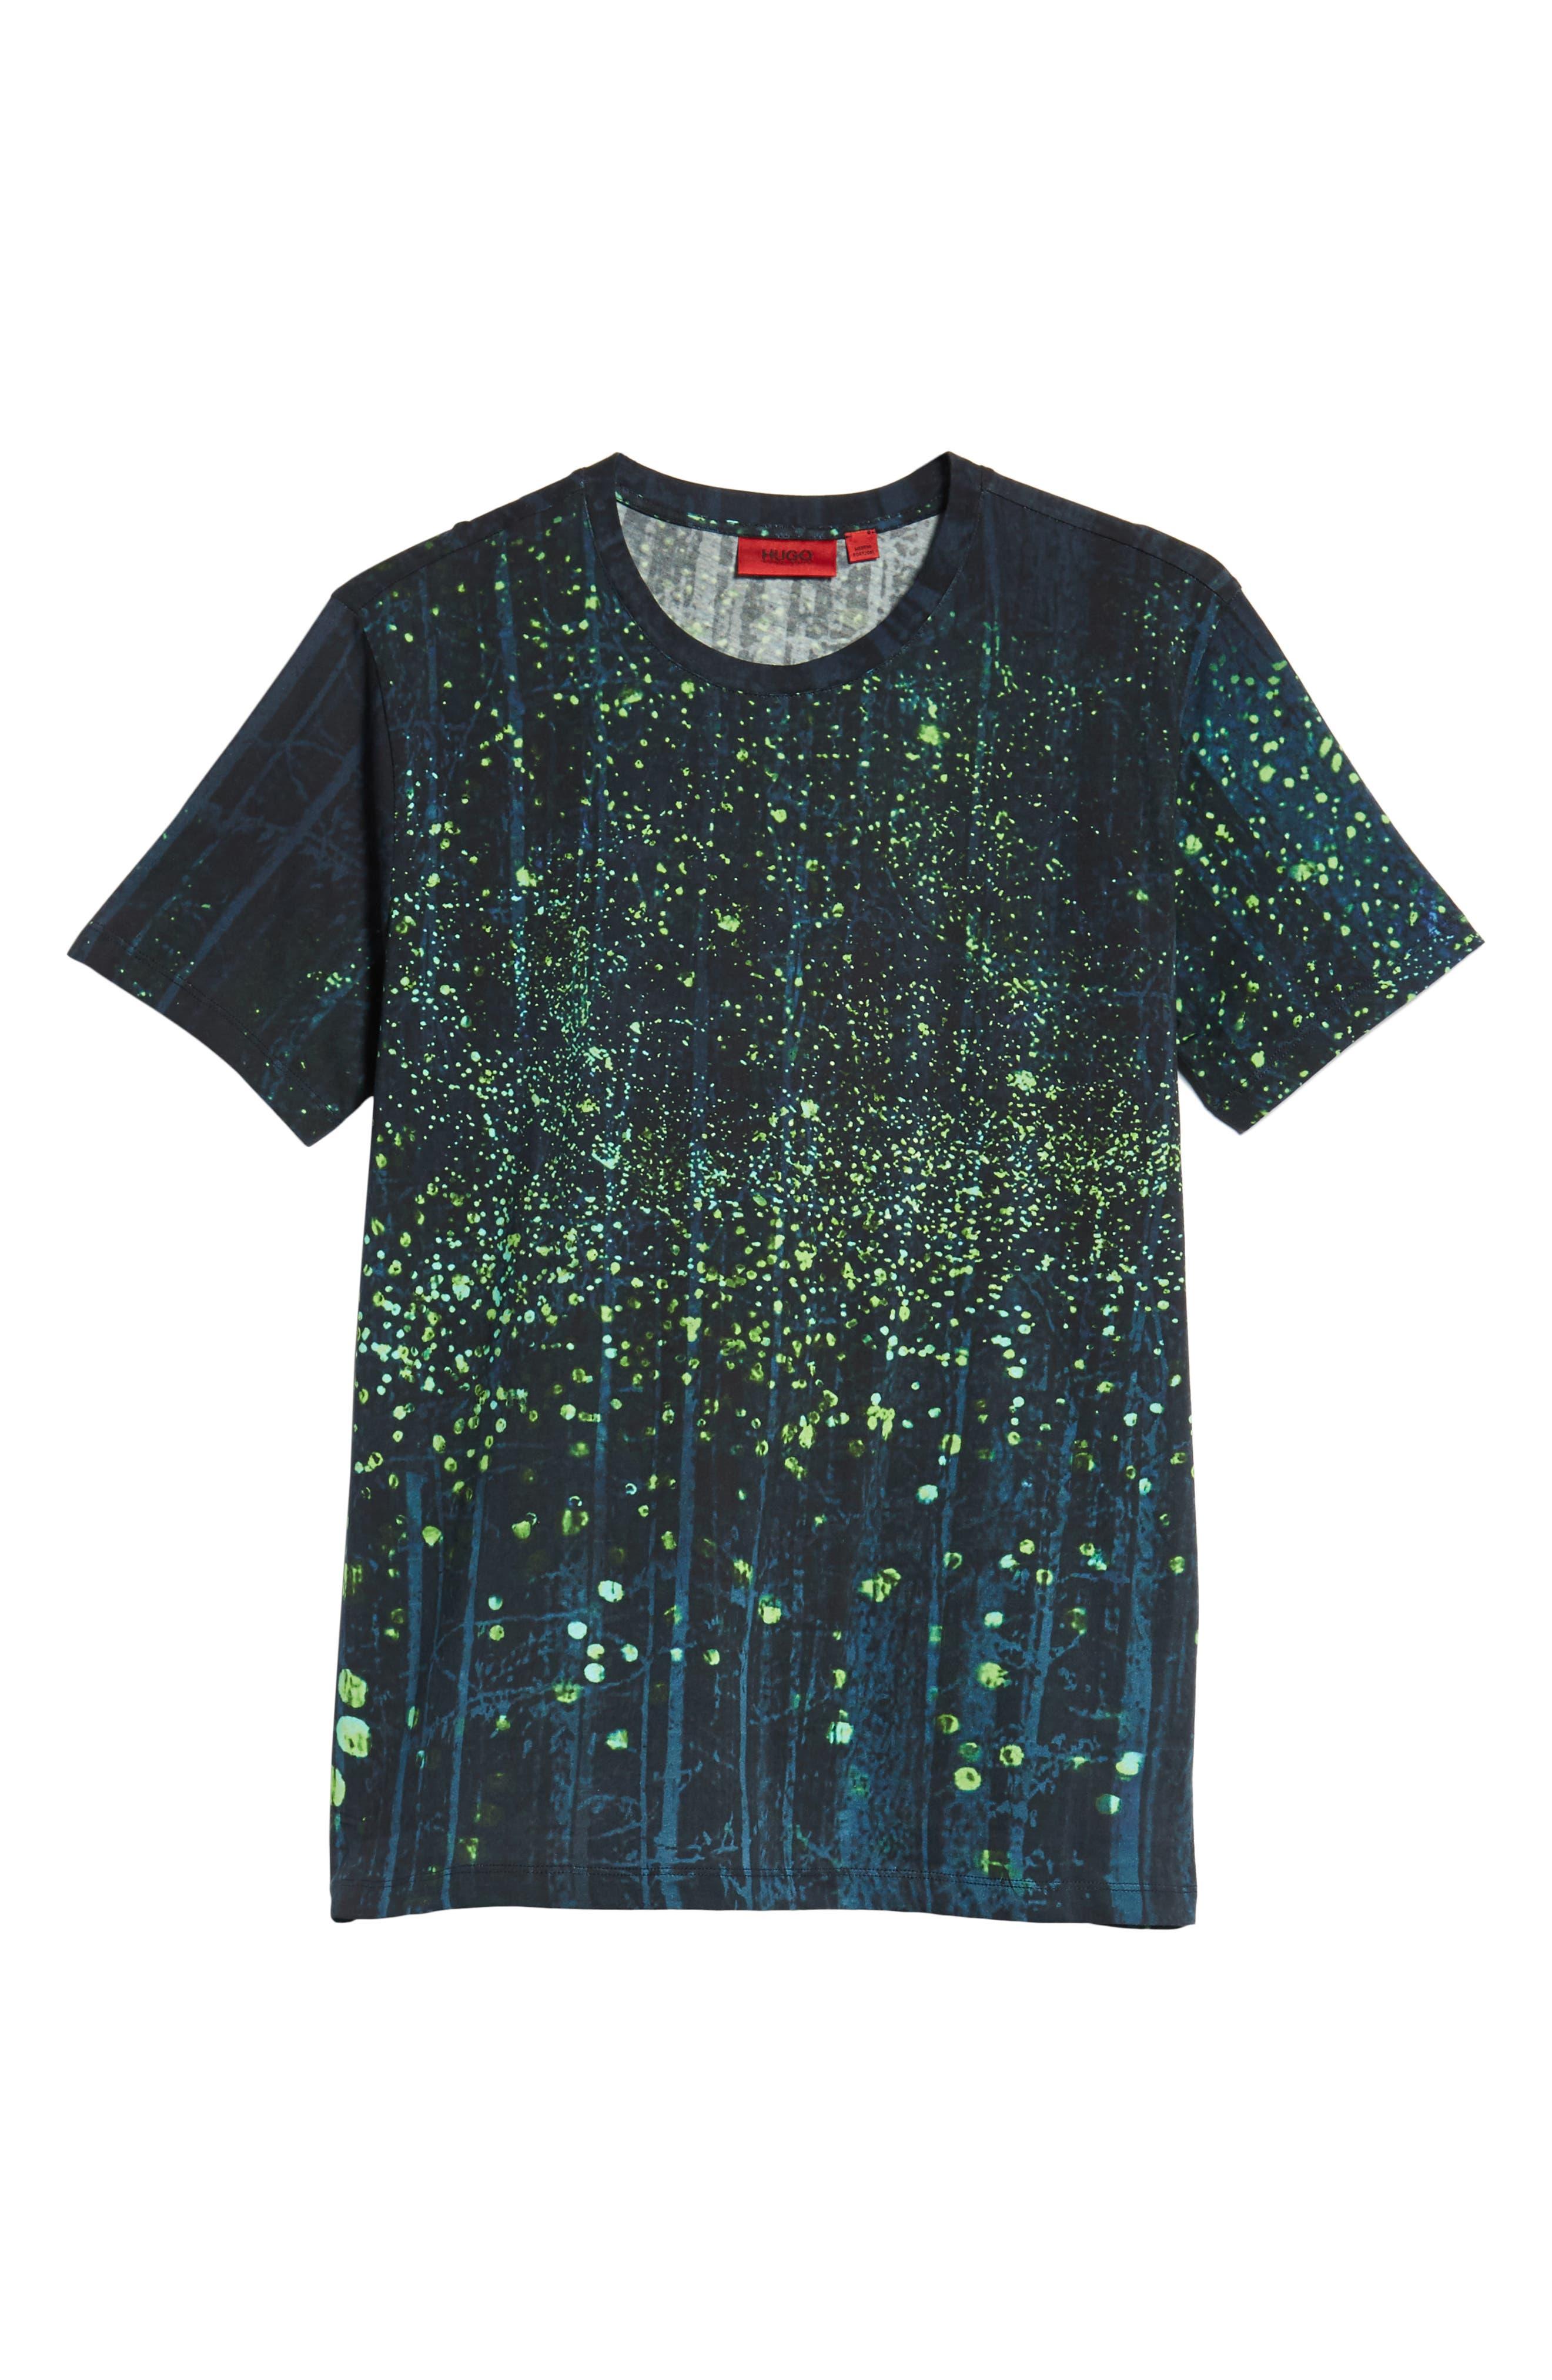 Dorest Digital Print Regular Fit T-Shirt,                             Alternate thumbnail 6, color,                             001